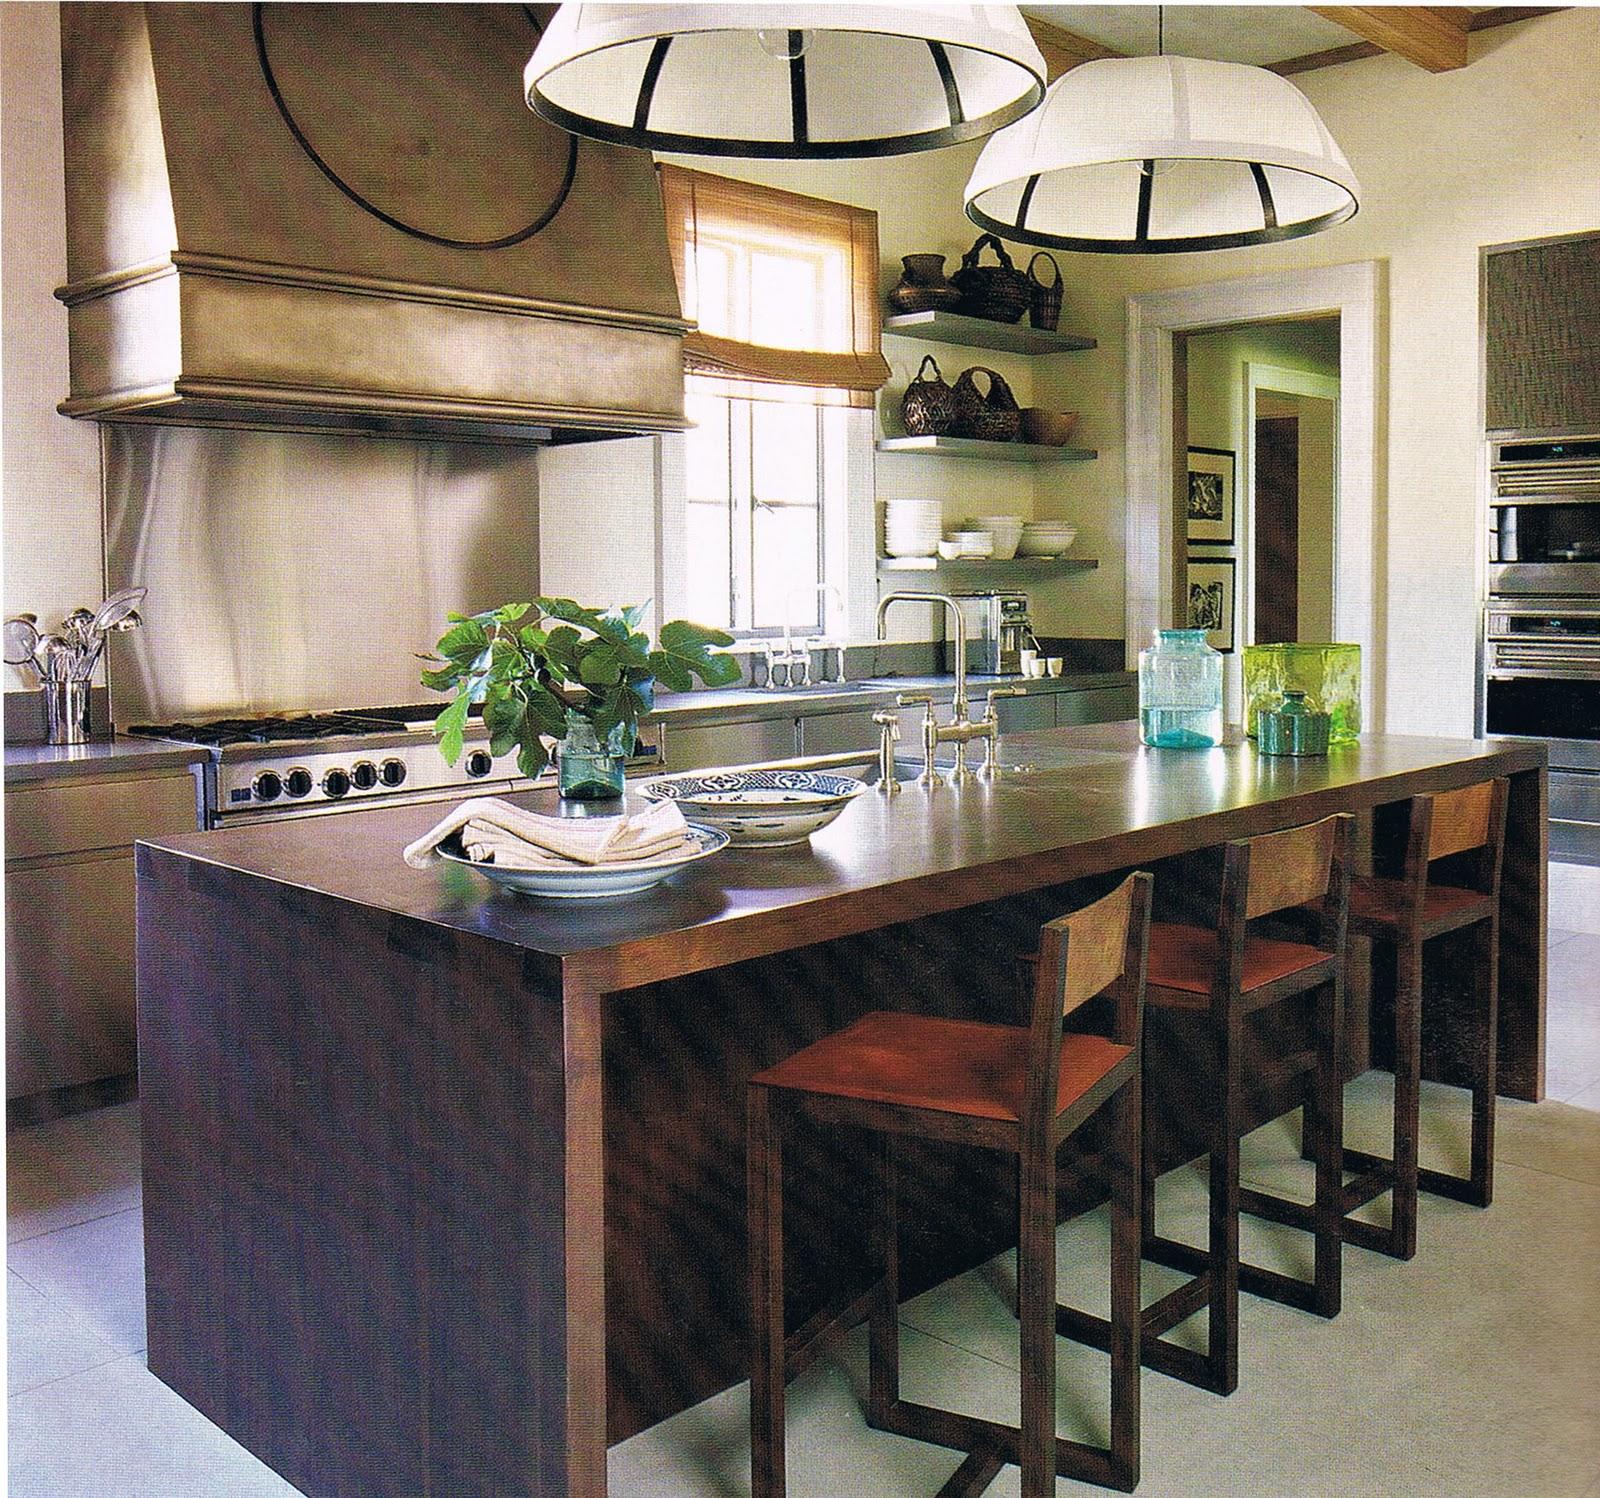 portable kitchen island bar kitchen island with chairs Portable kitchen island bar Photo 5